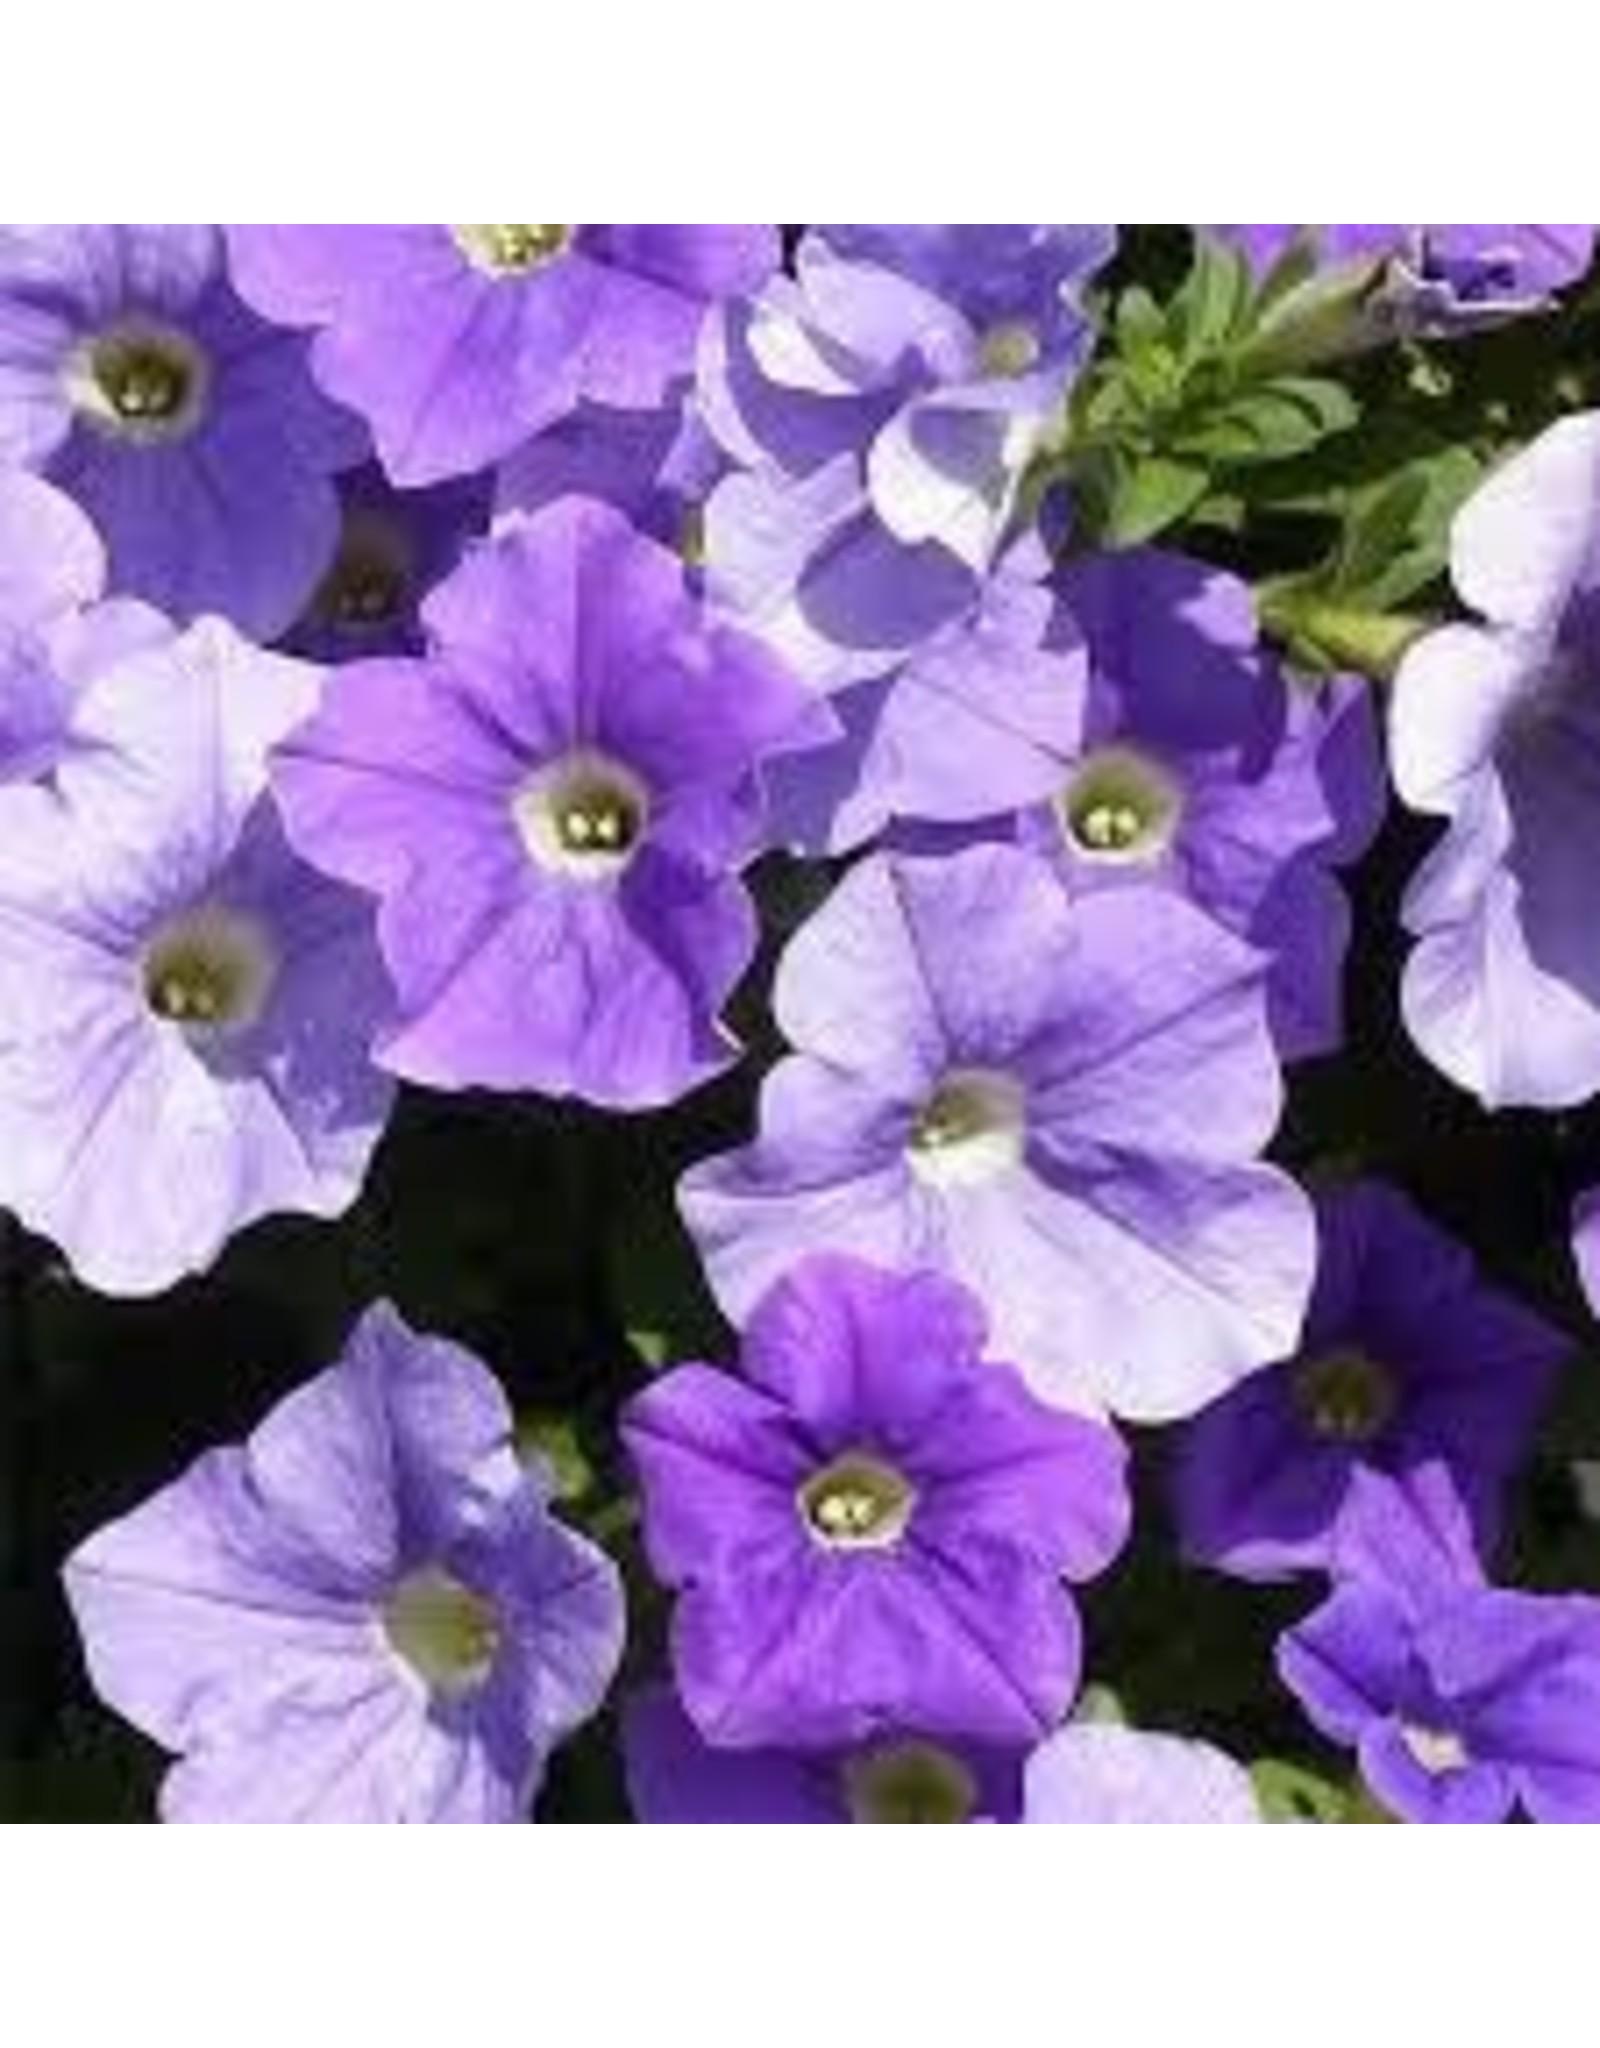 Petunia 'Surfinia Sky Blue' 4 Inch